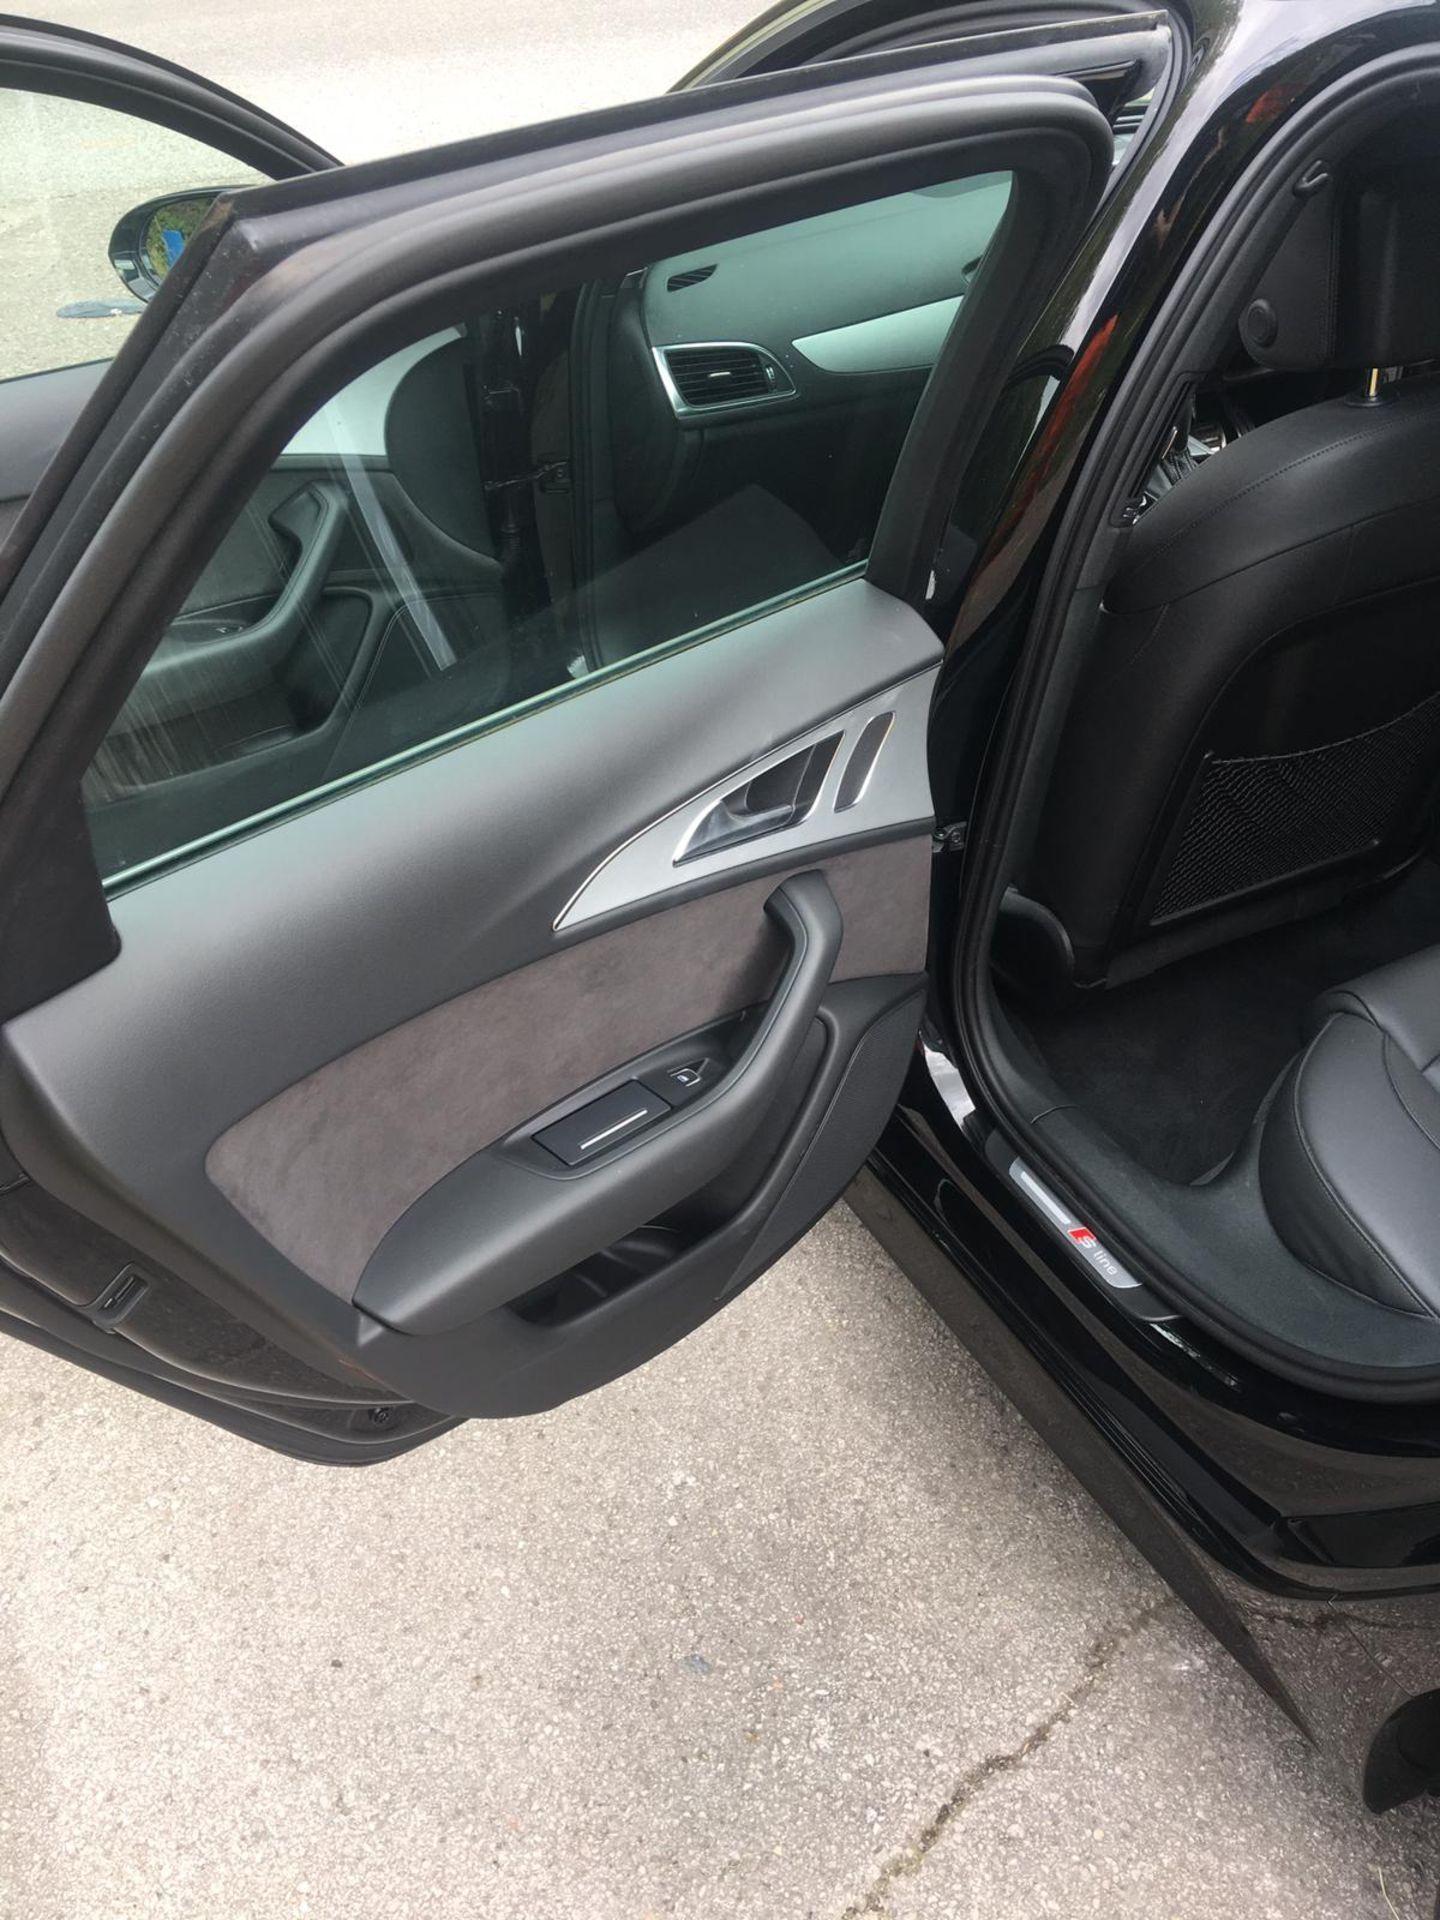 2018/18 REG AUDI A6 S LINE TDI ULTRA SEMI-AUTO 2.0 DIESEL ESTATE, SHOWING 1 FORMER KEEPER *NO VAT* - Image 30 of 33